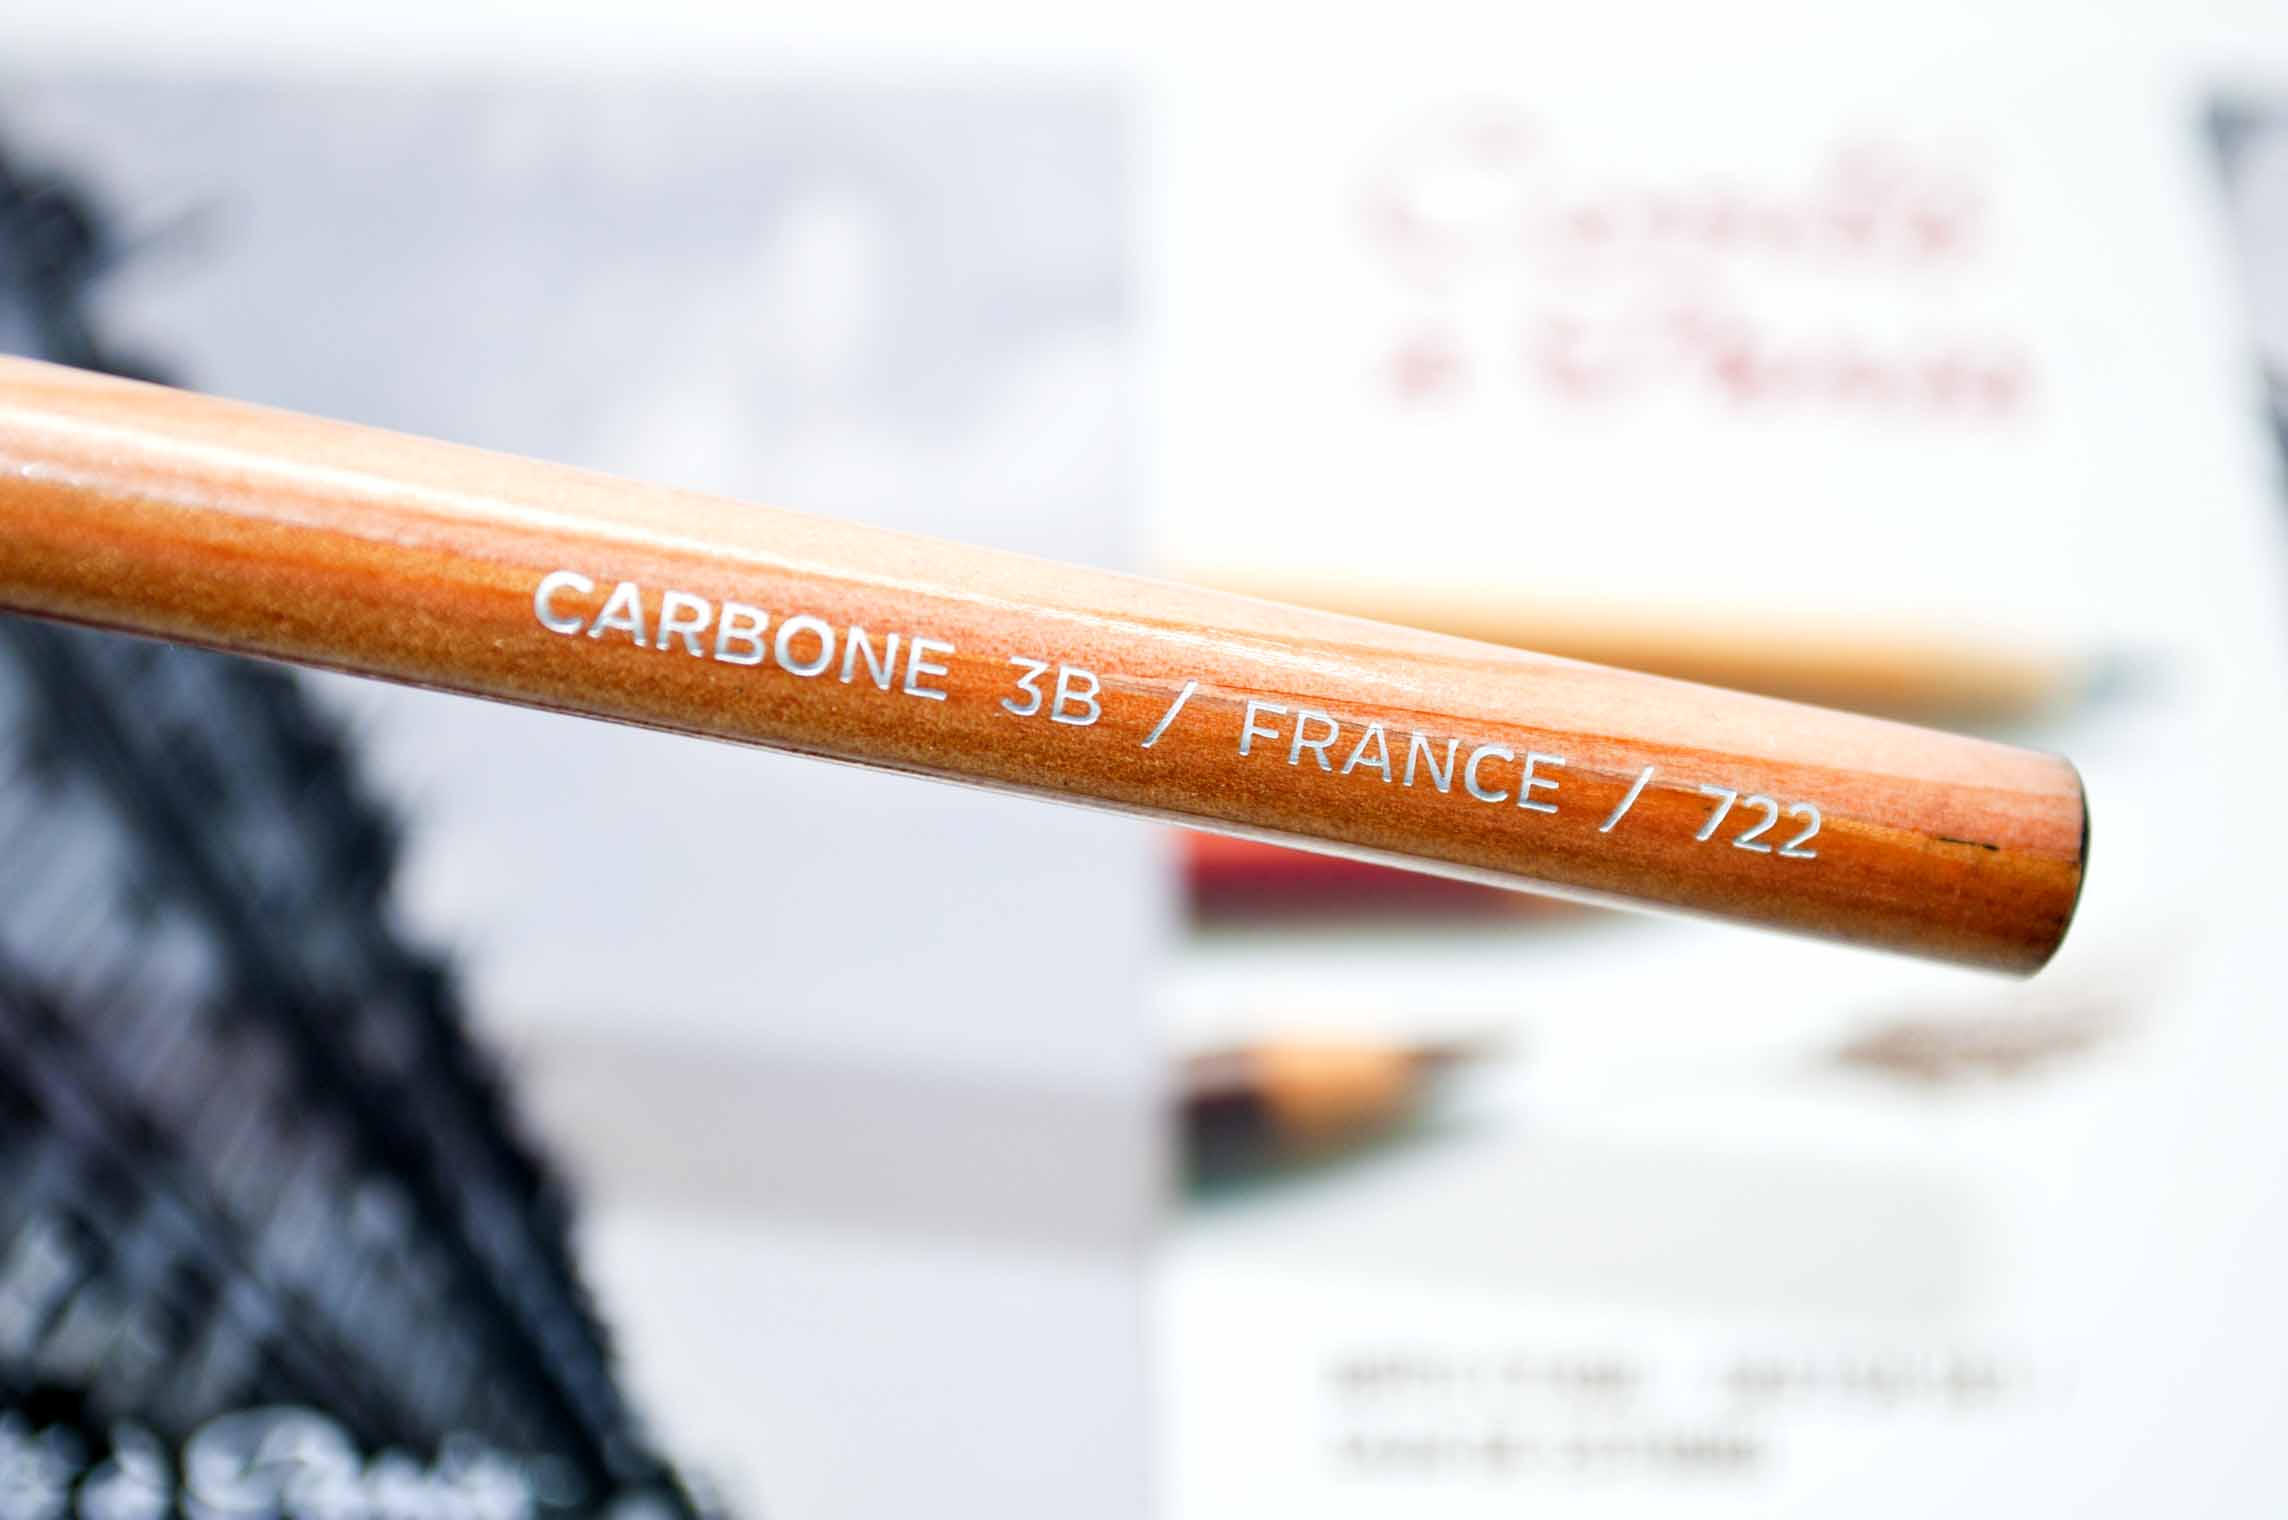 Conte Carbone Info 2.jpg